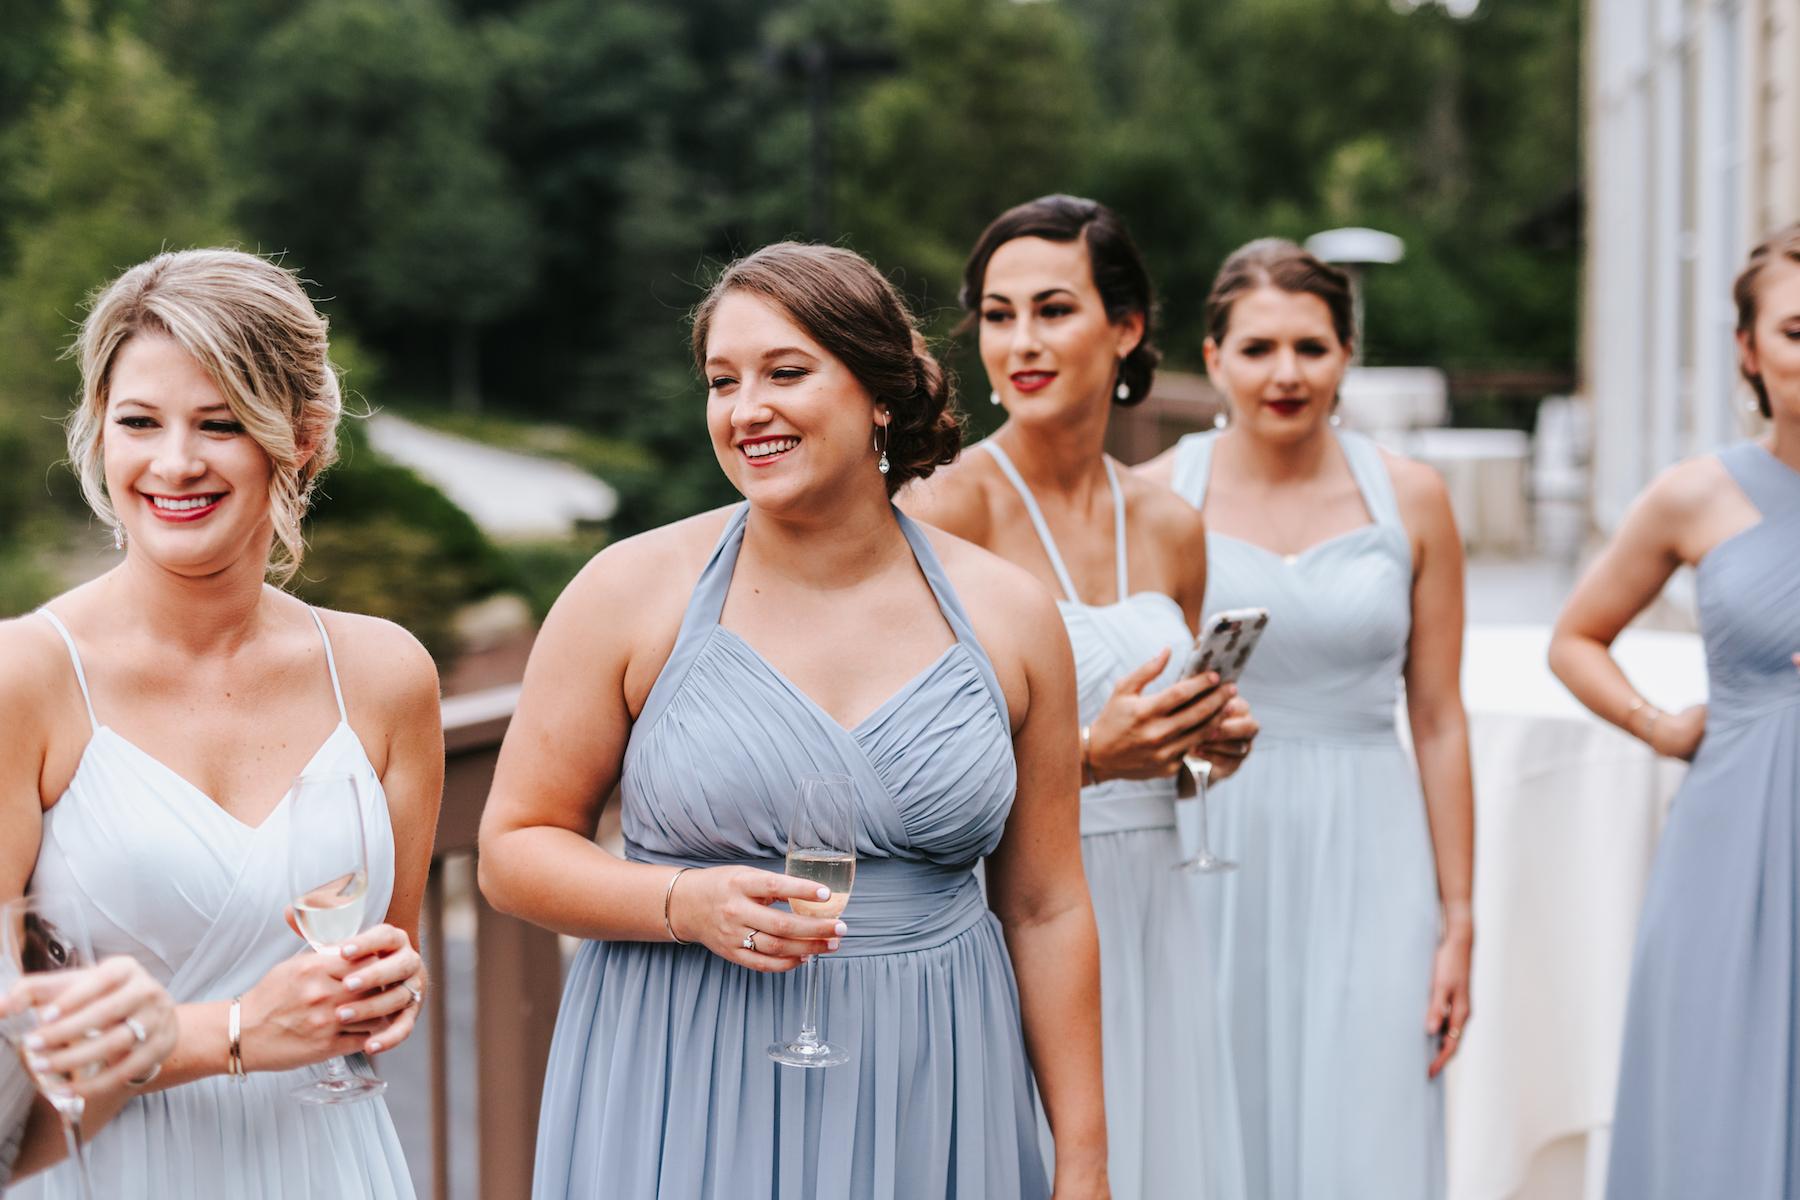 wedding-engagement-photographer-spartanburg-greenville-columbia-carolina-south-north-461.JPG